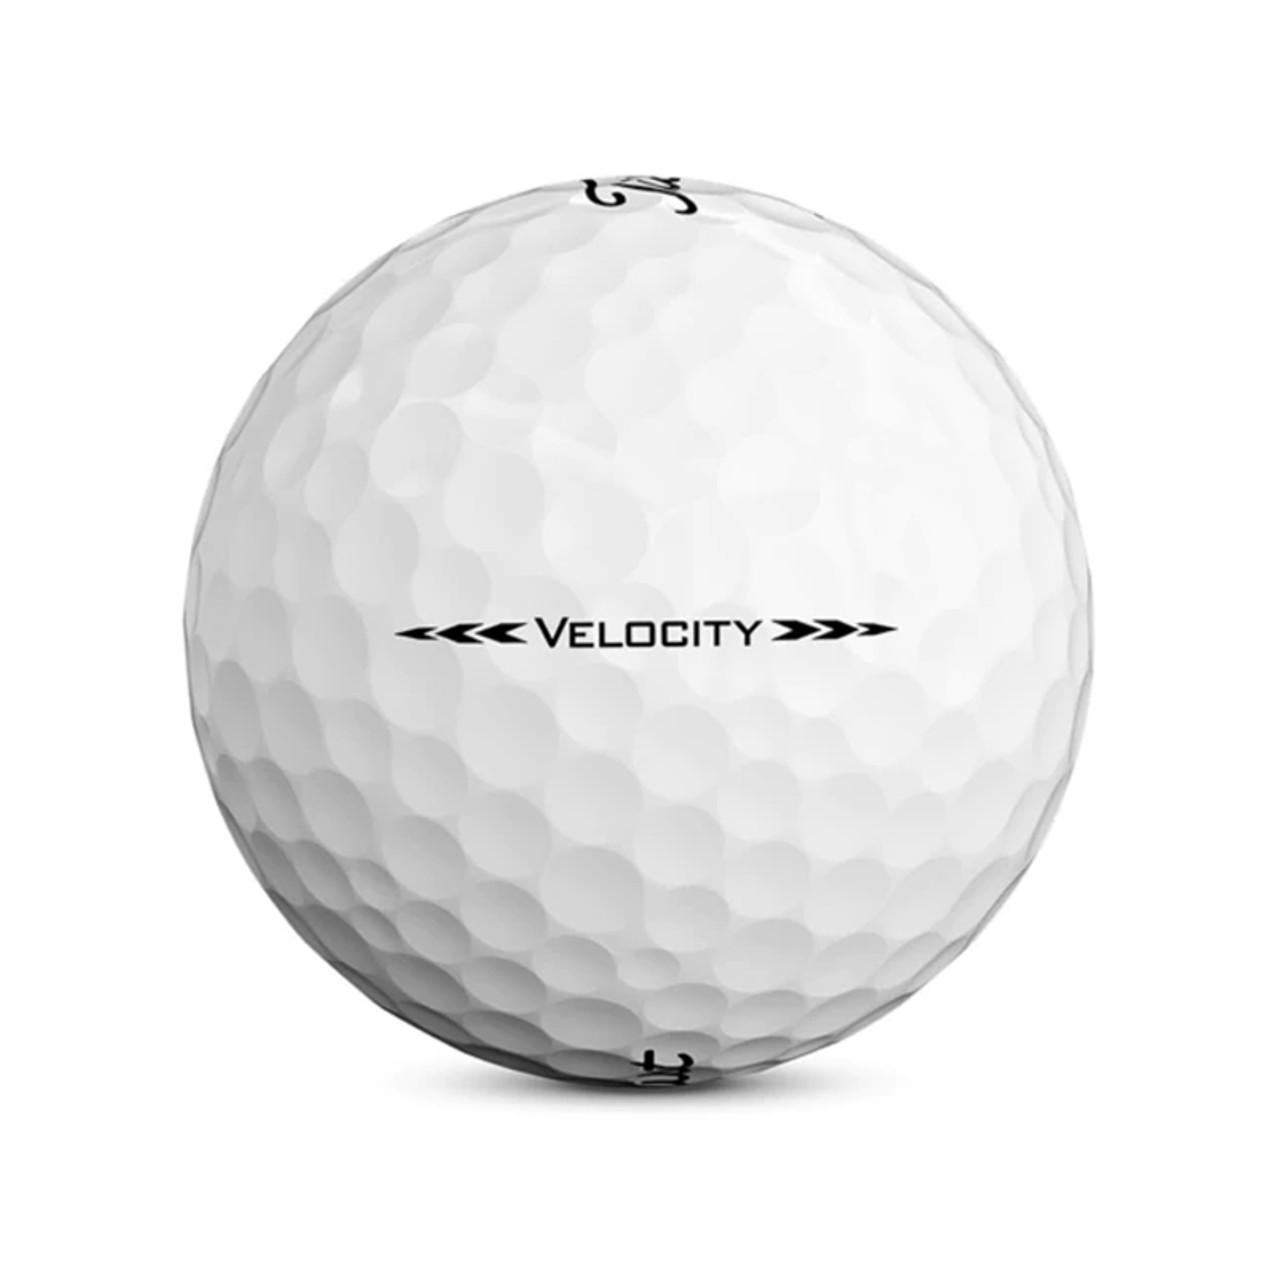 Titleist Velocity Personalized Dozen Golf Balls 2020